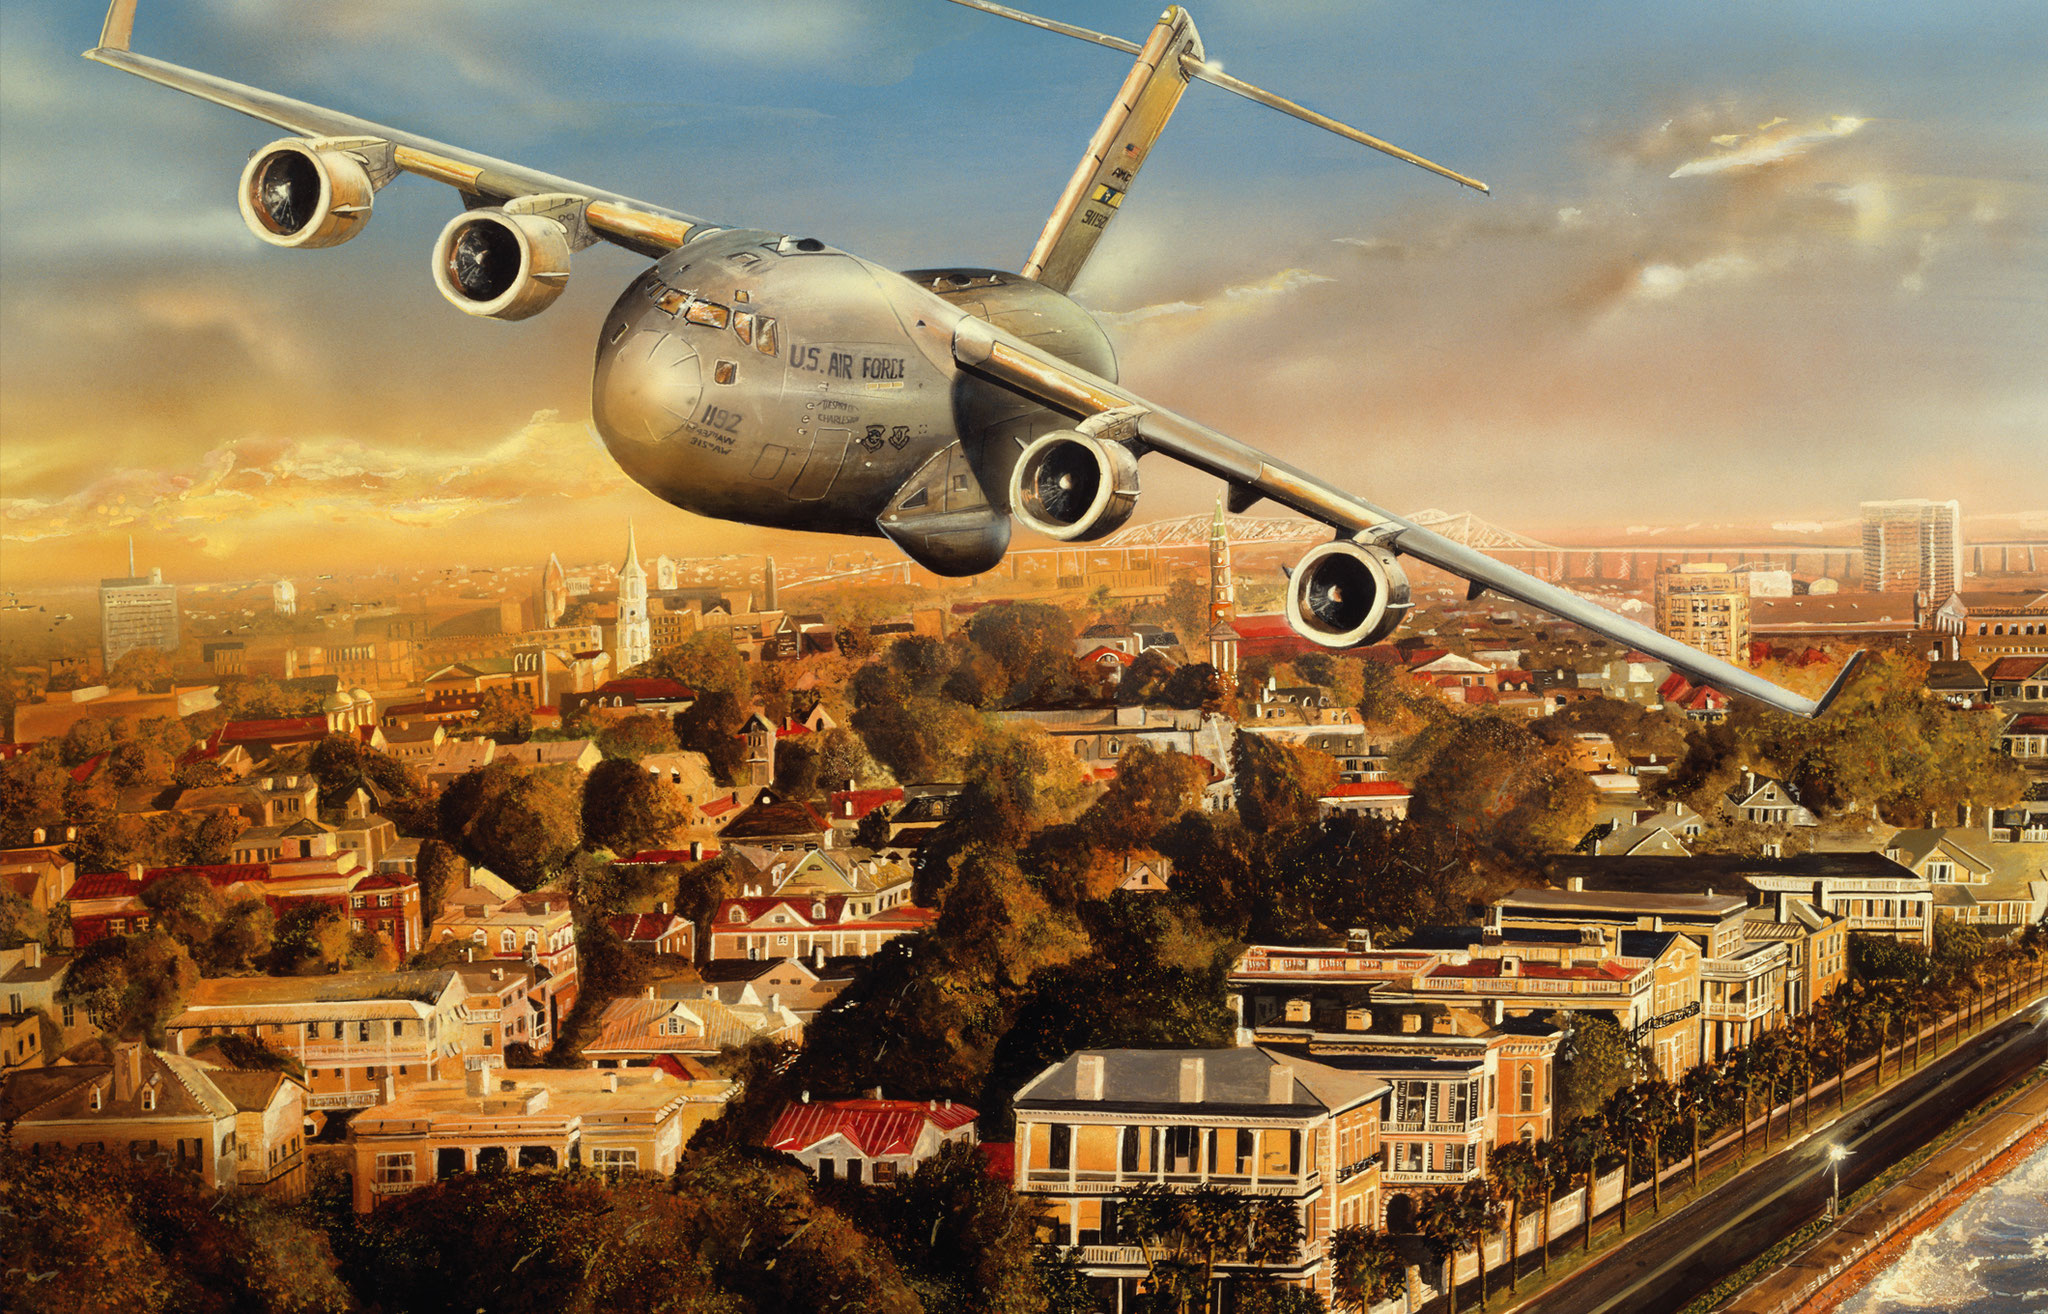 Sullivan_Boeing_Charleston_C17_AviationArt